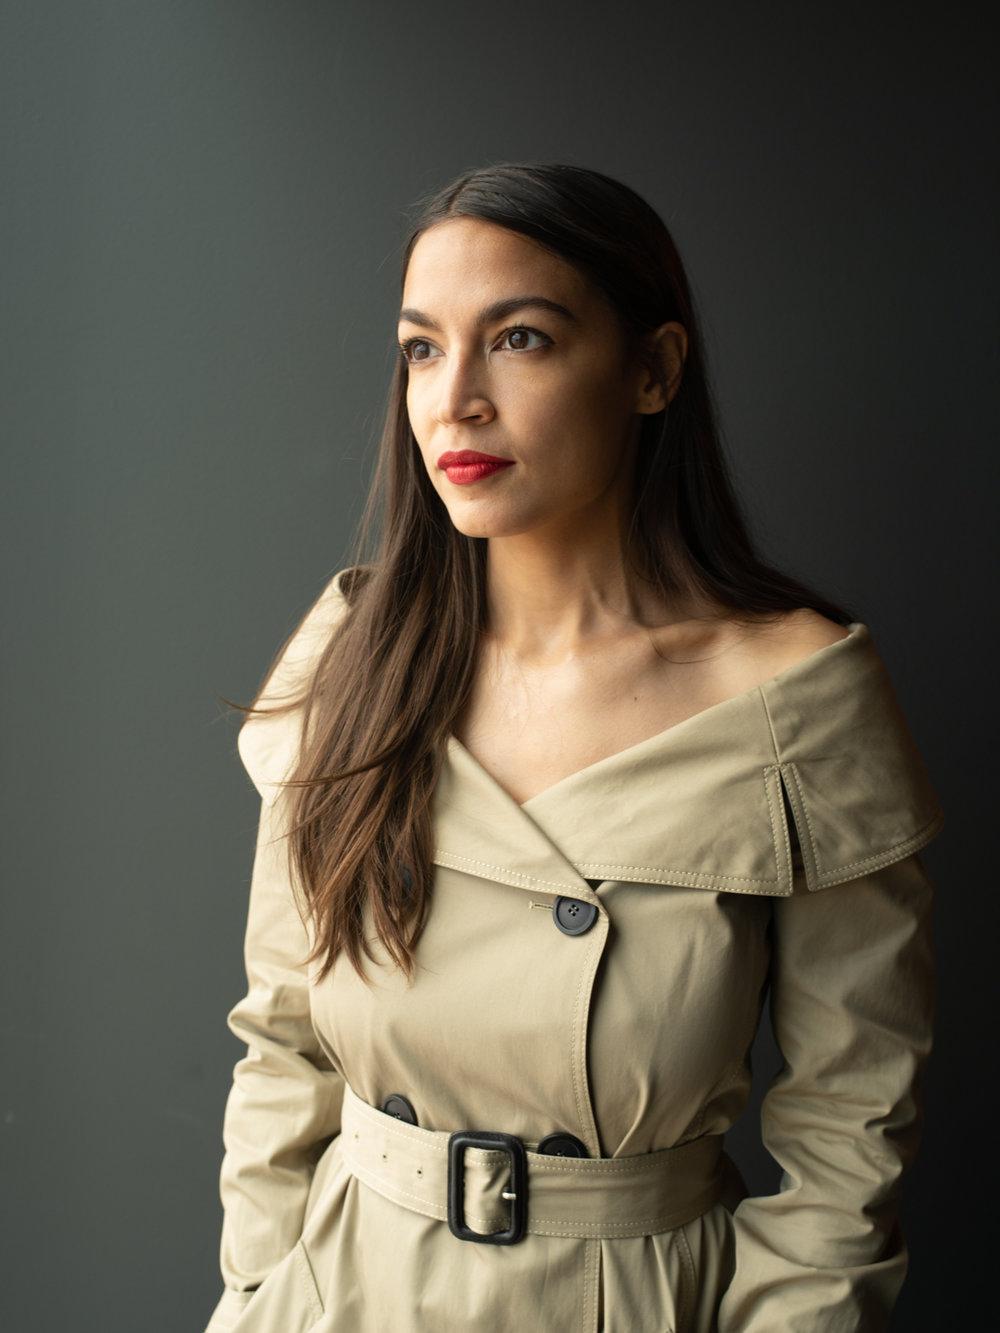 Alexandria Ocasio Cortez / Interview Magazine